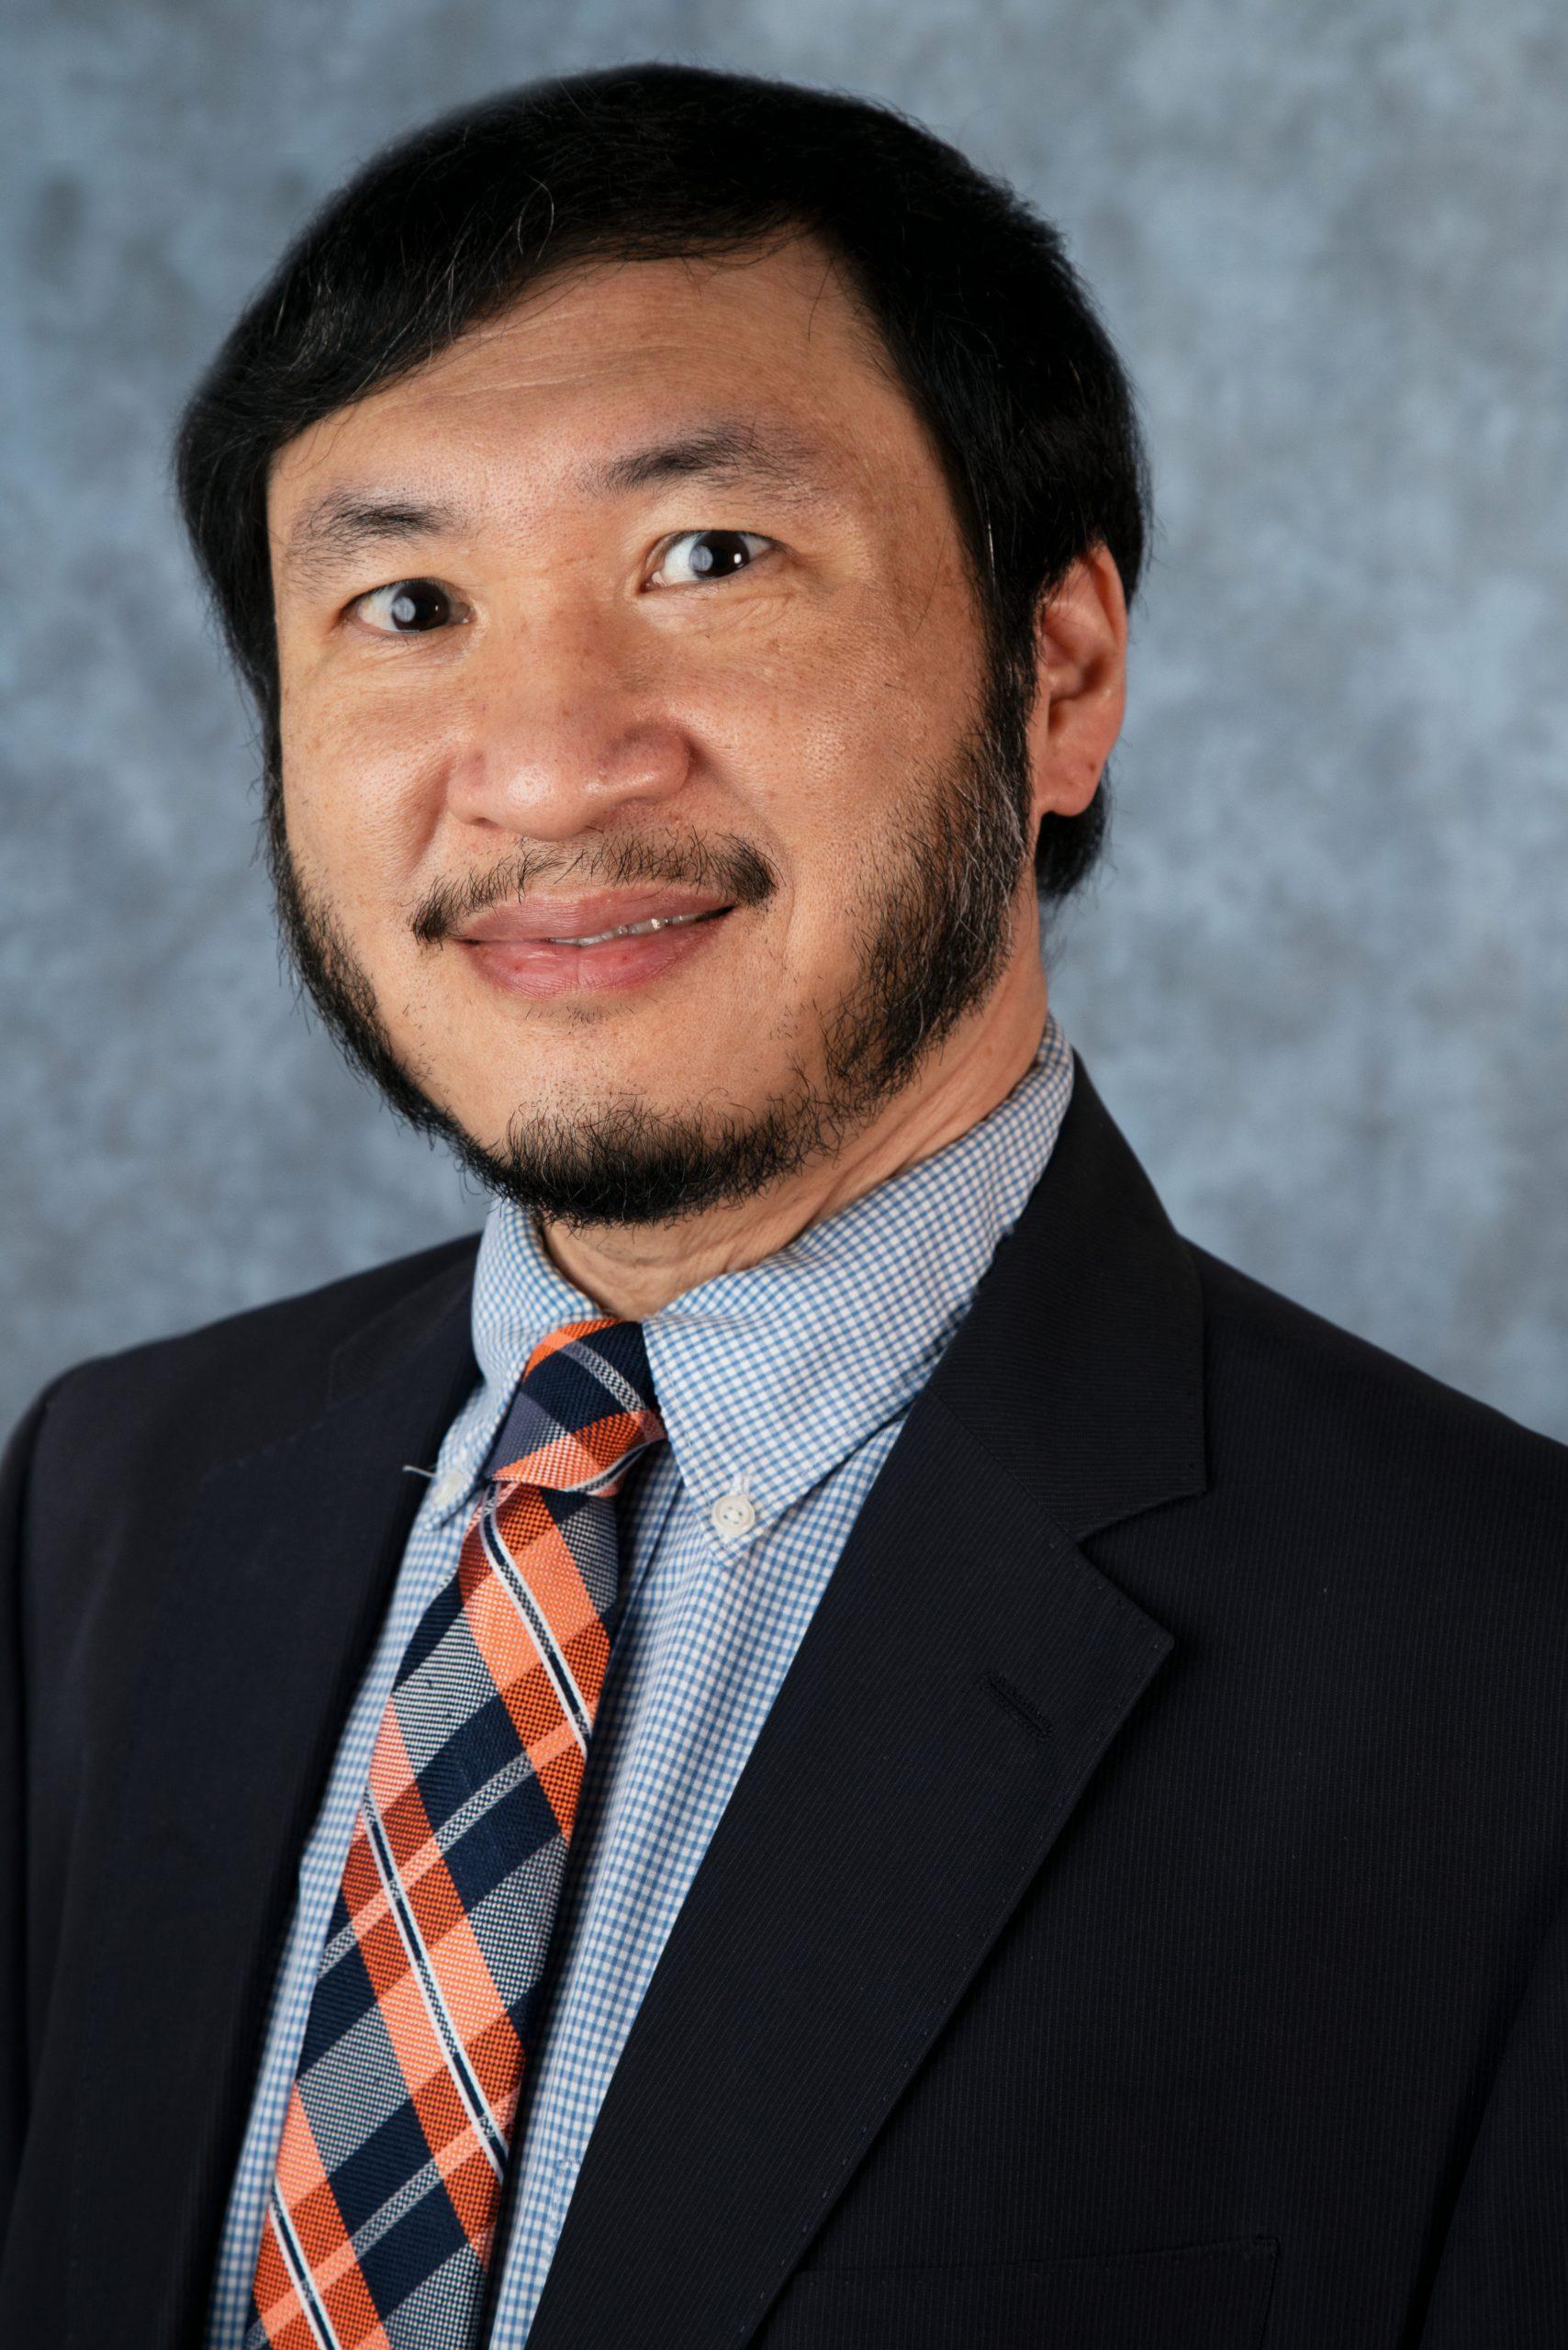 Image of Mark Leung, Ph.D.